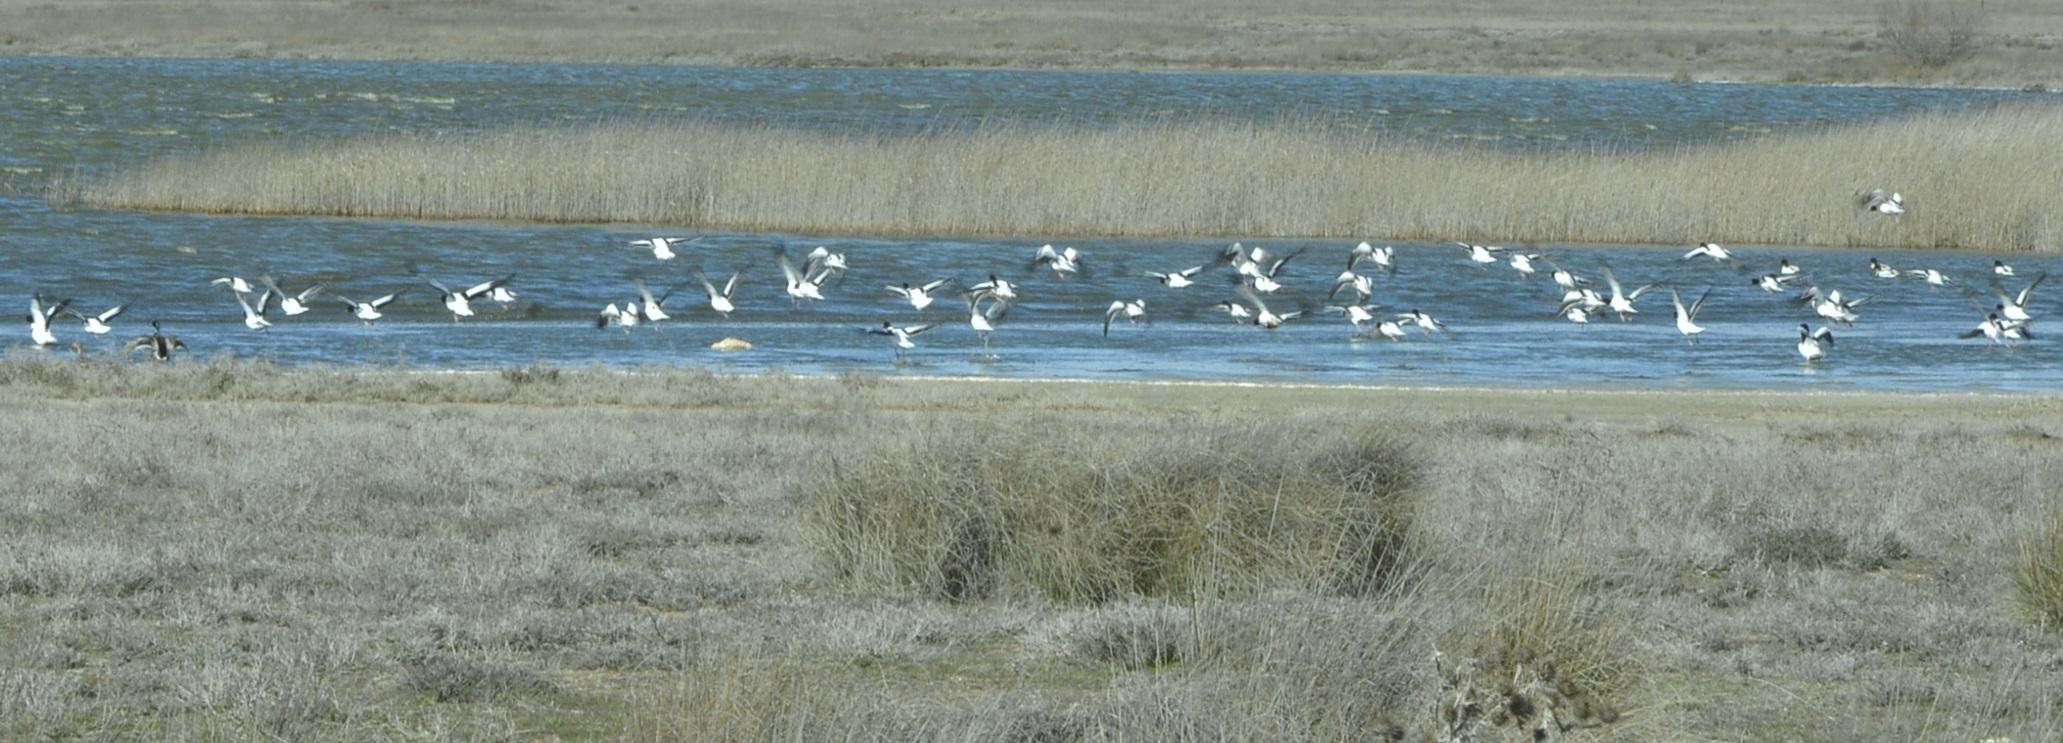 Aves acuáticas sobre las lagunas